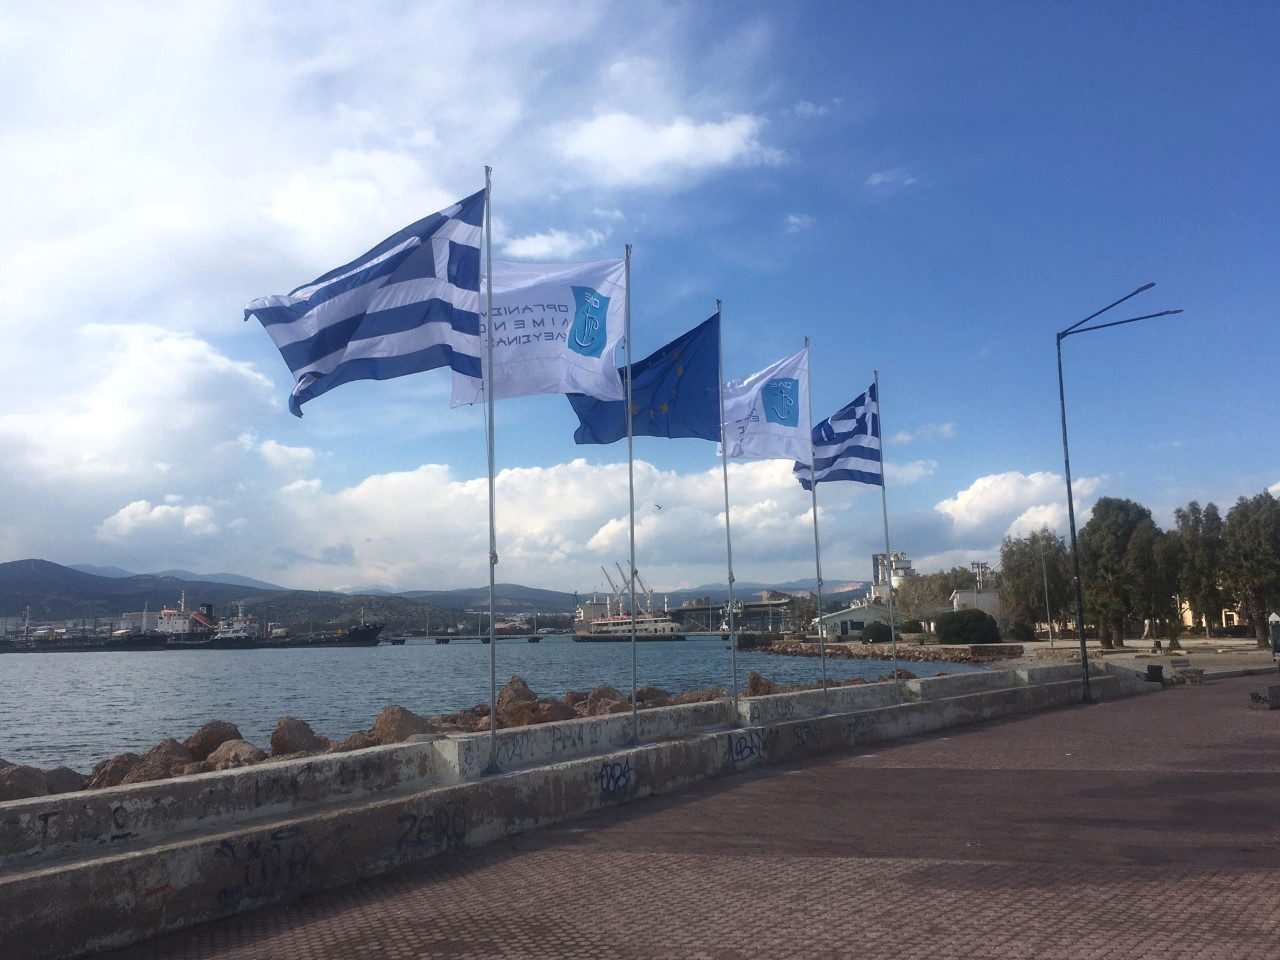 You are currently viewing 25η Μαρτίου: Ο ΟΛΕ τιμά την επέτειο των 200 χρόνων από την Ελληνική Επανάσταση 1821